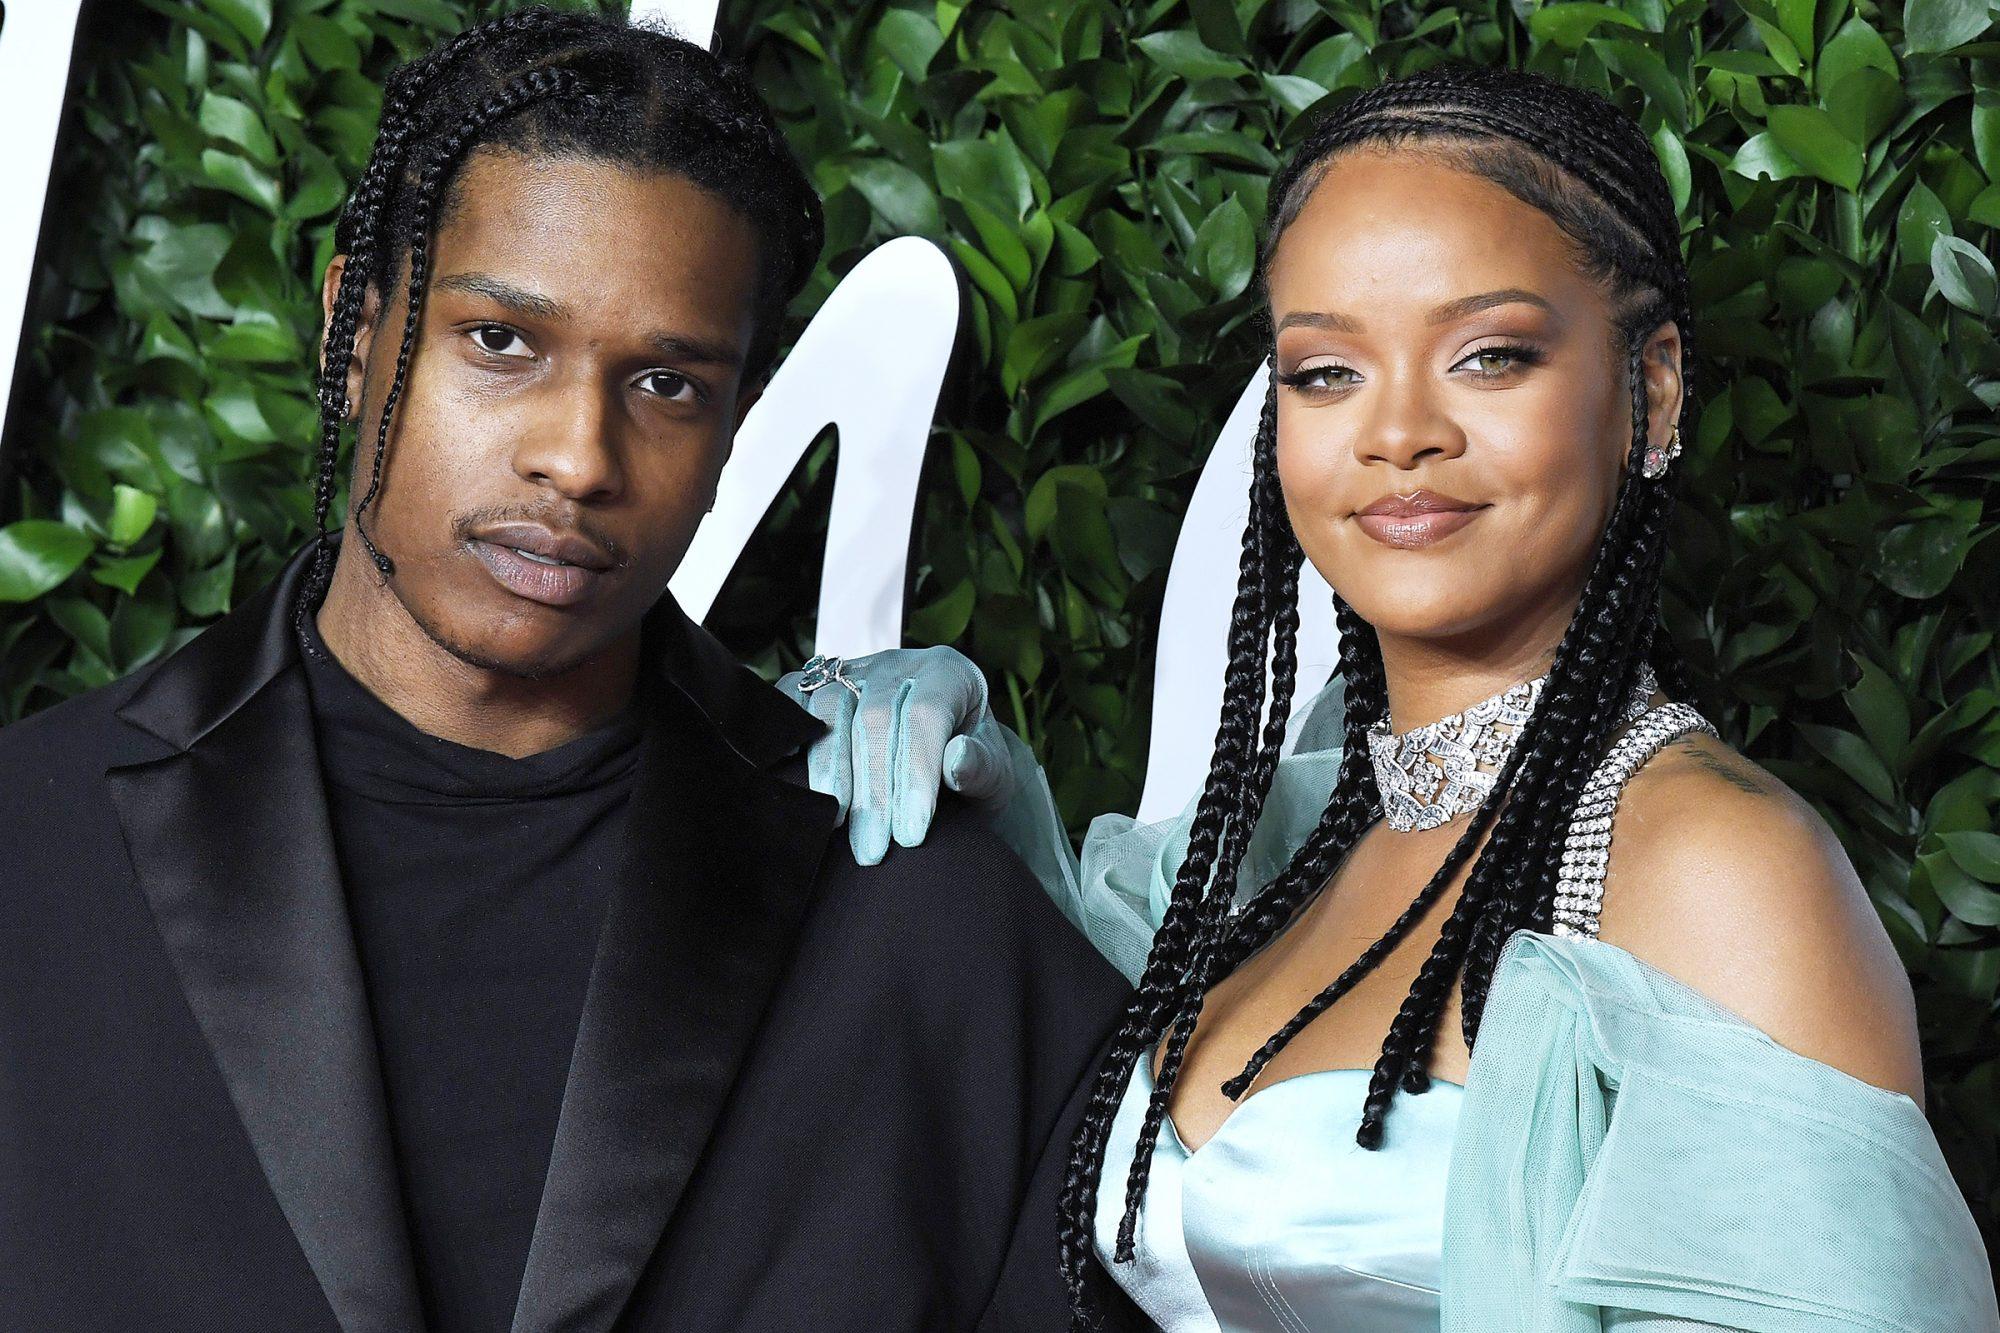 ASAP Rocky and Rihanna